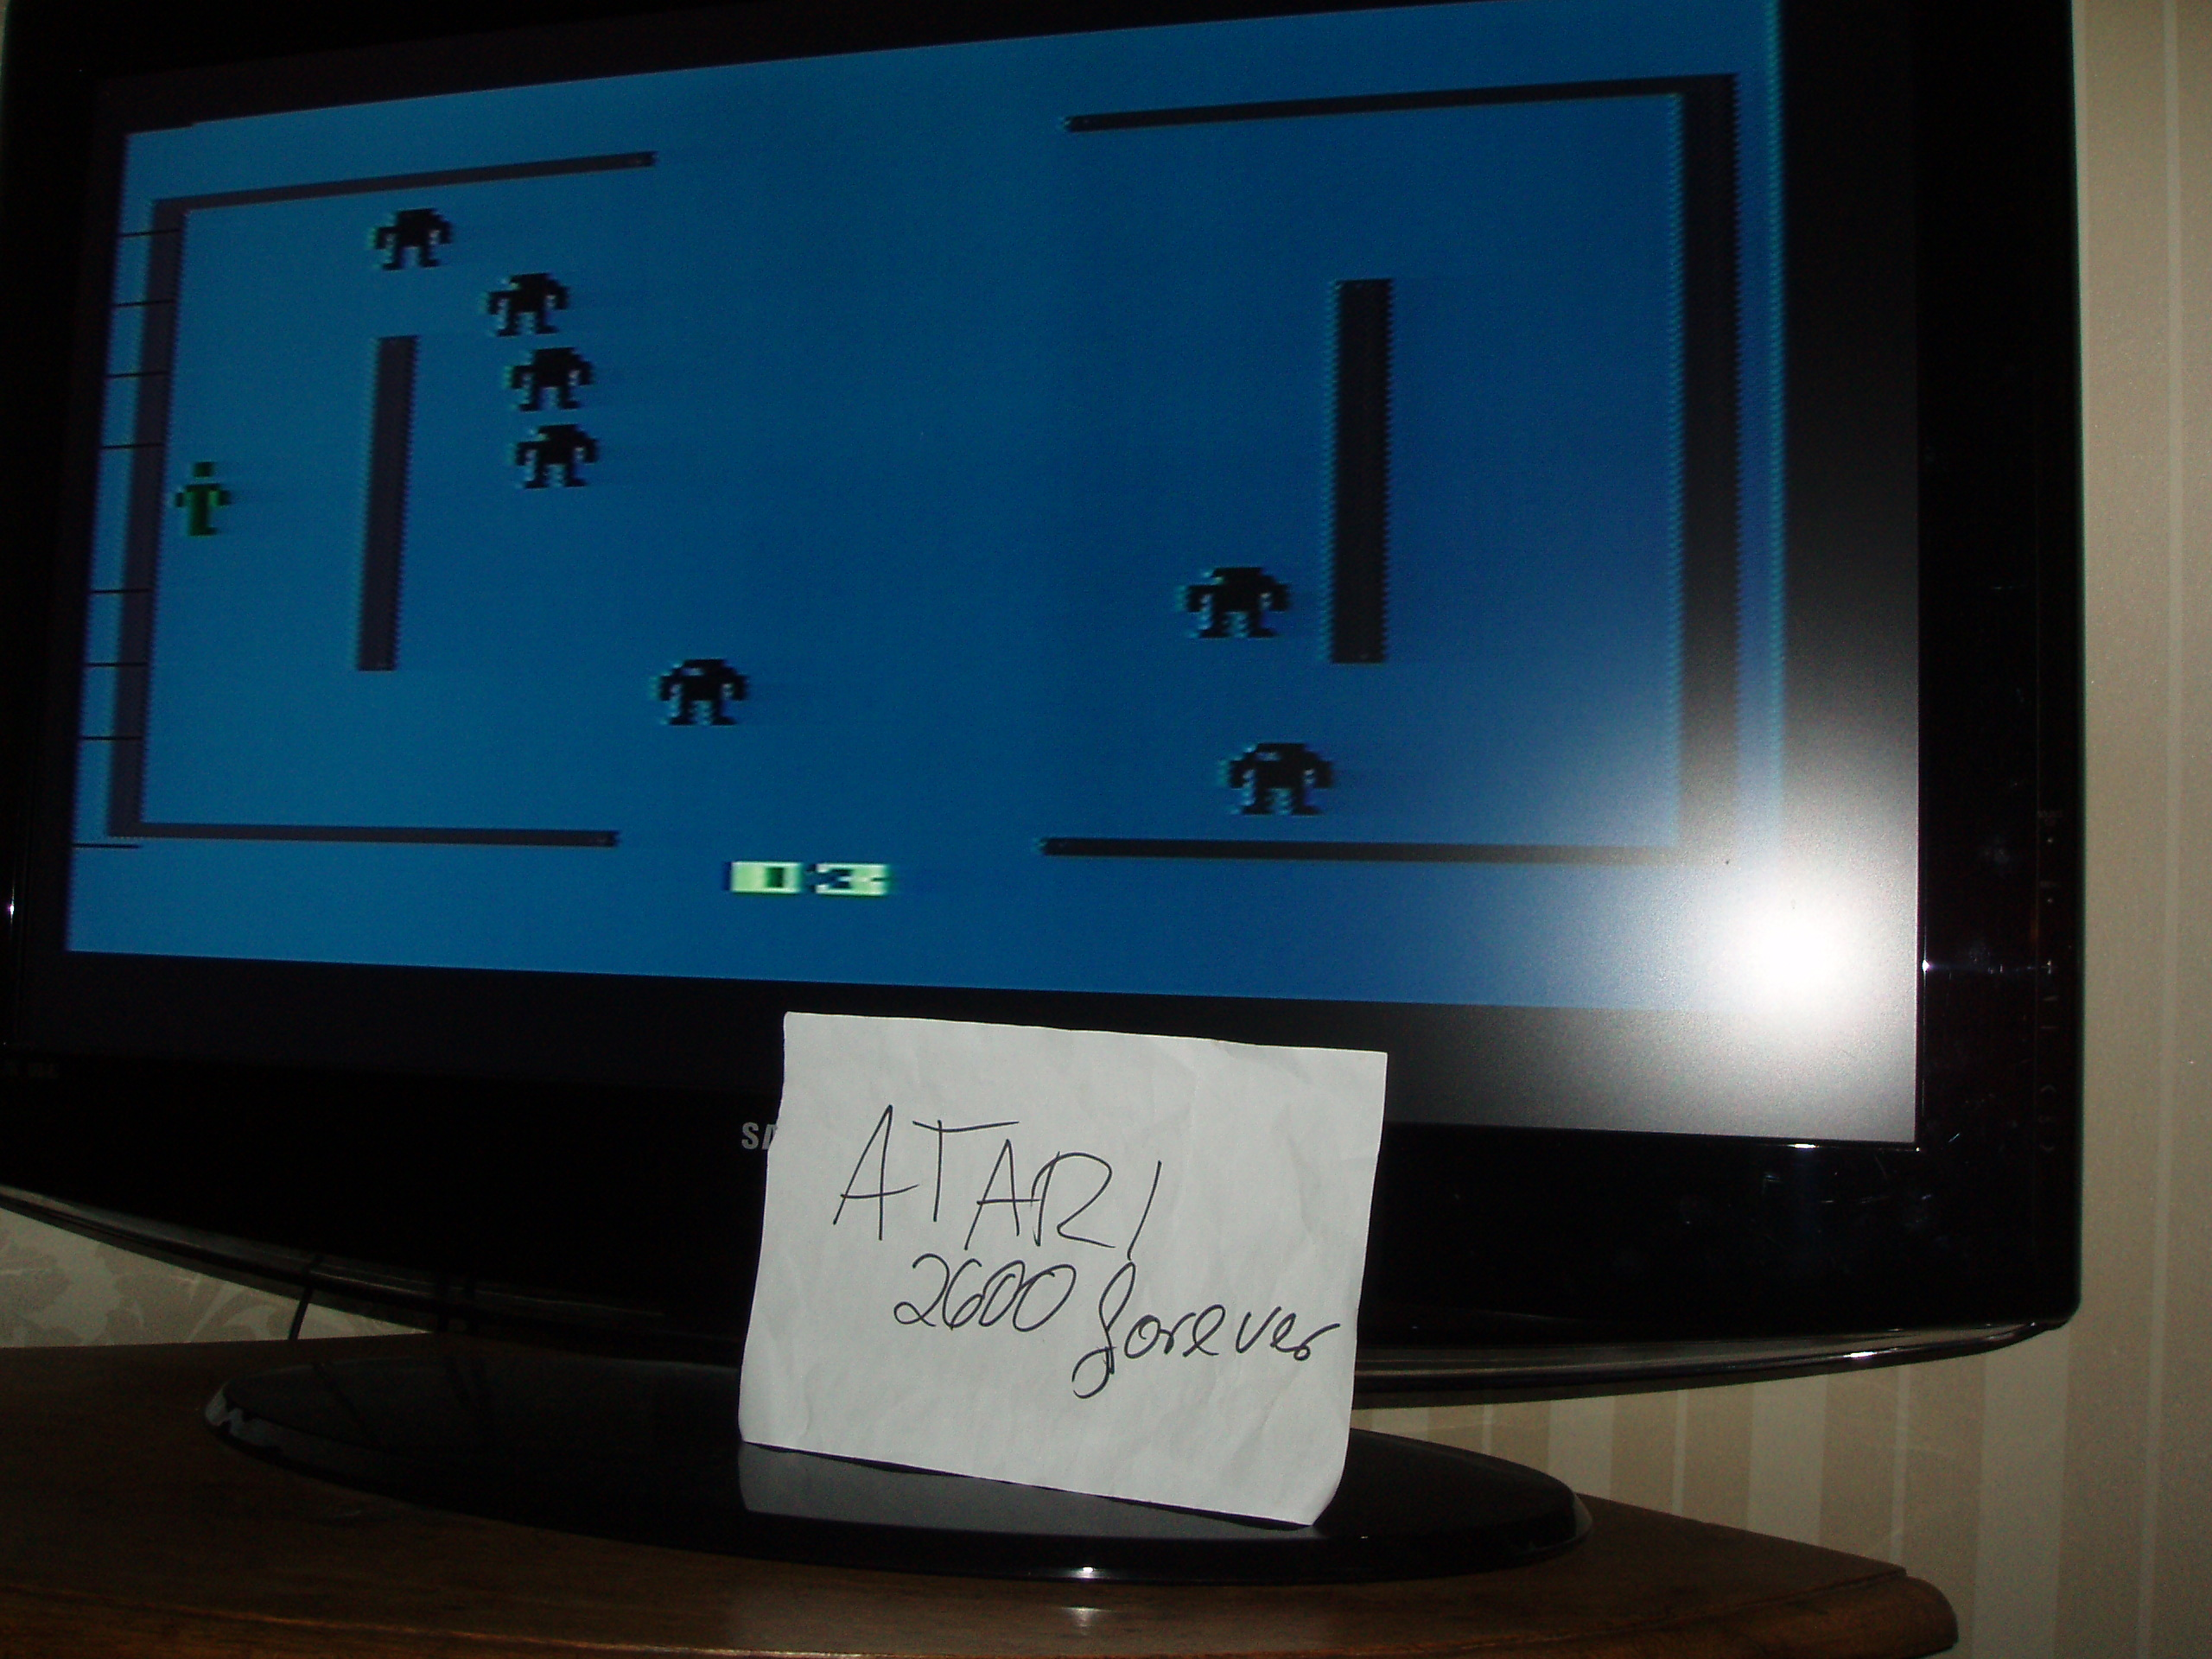 atari2600forever: Berzerk: Game 3 (Atari 2600) 6,420 points on 2019-02-25 03:17:16